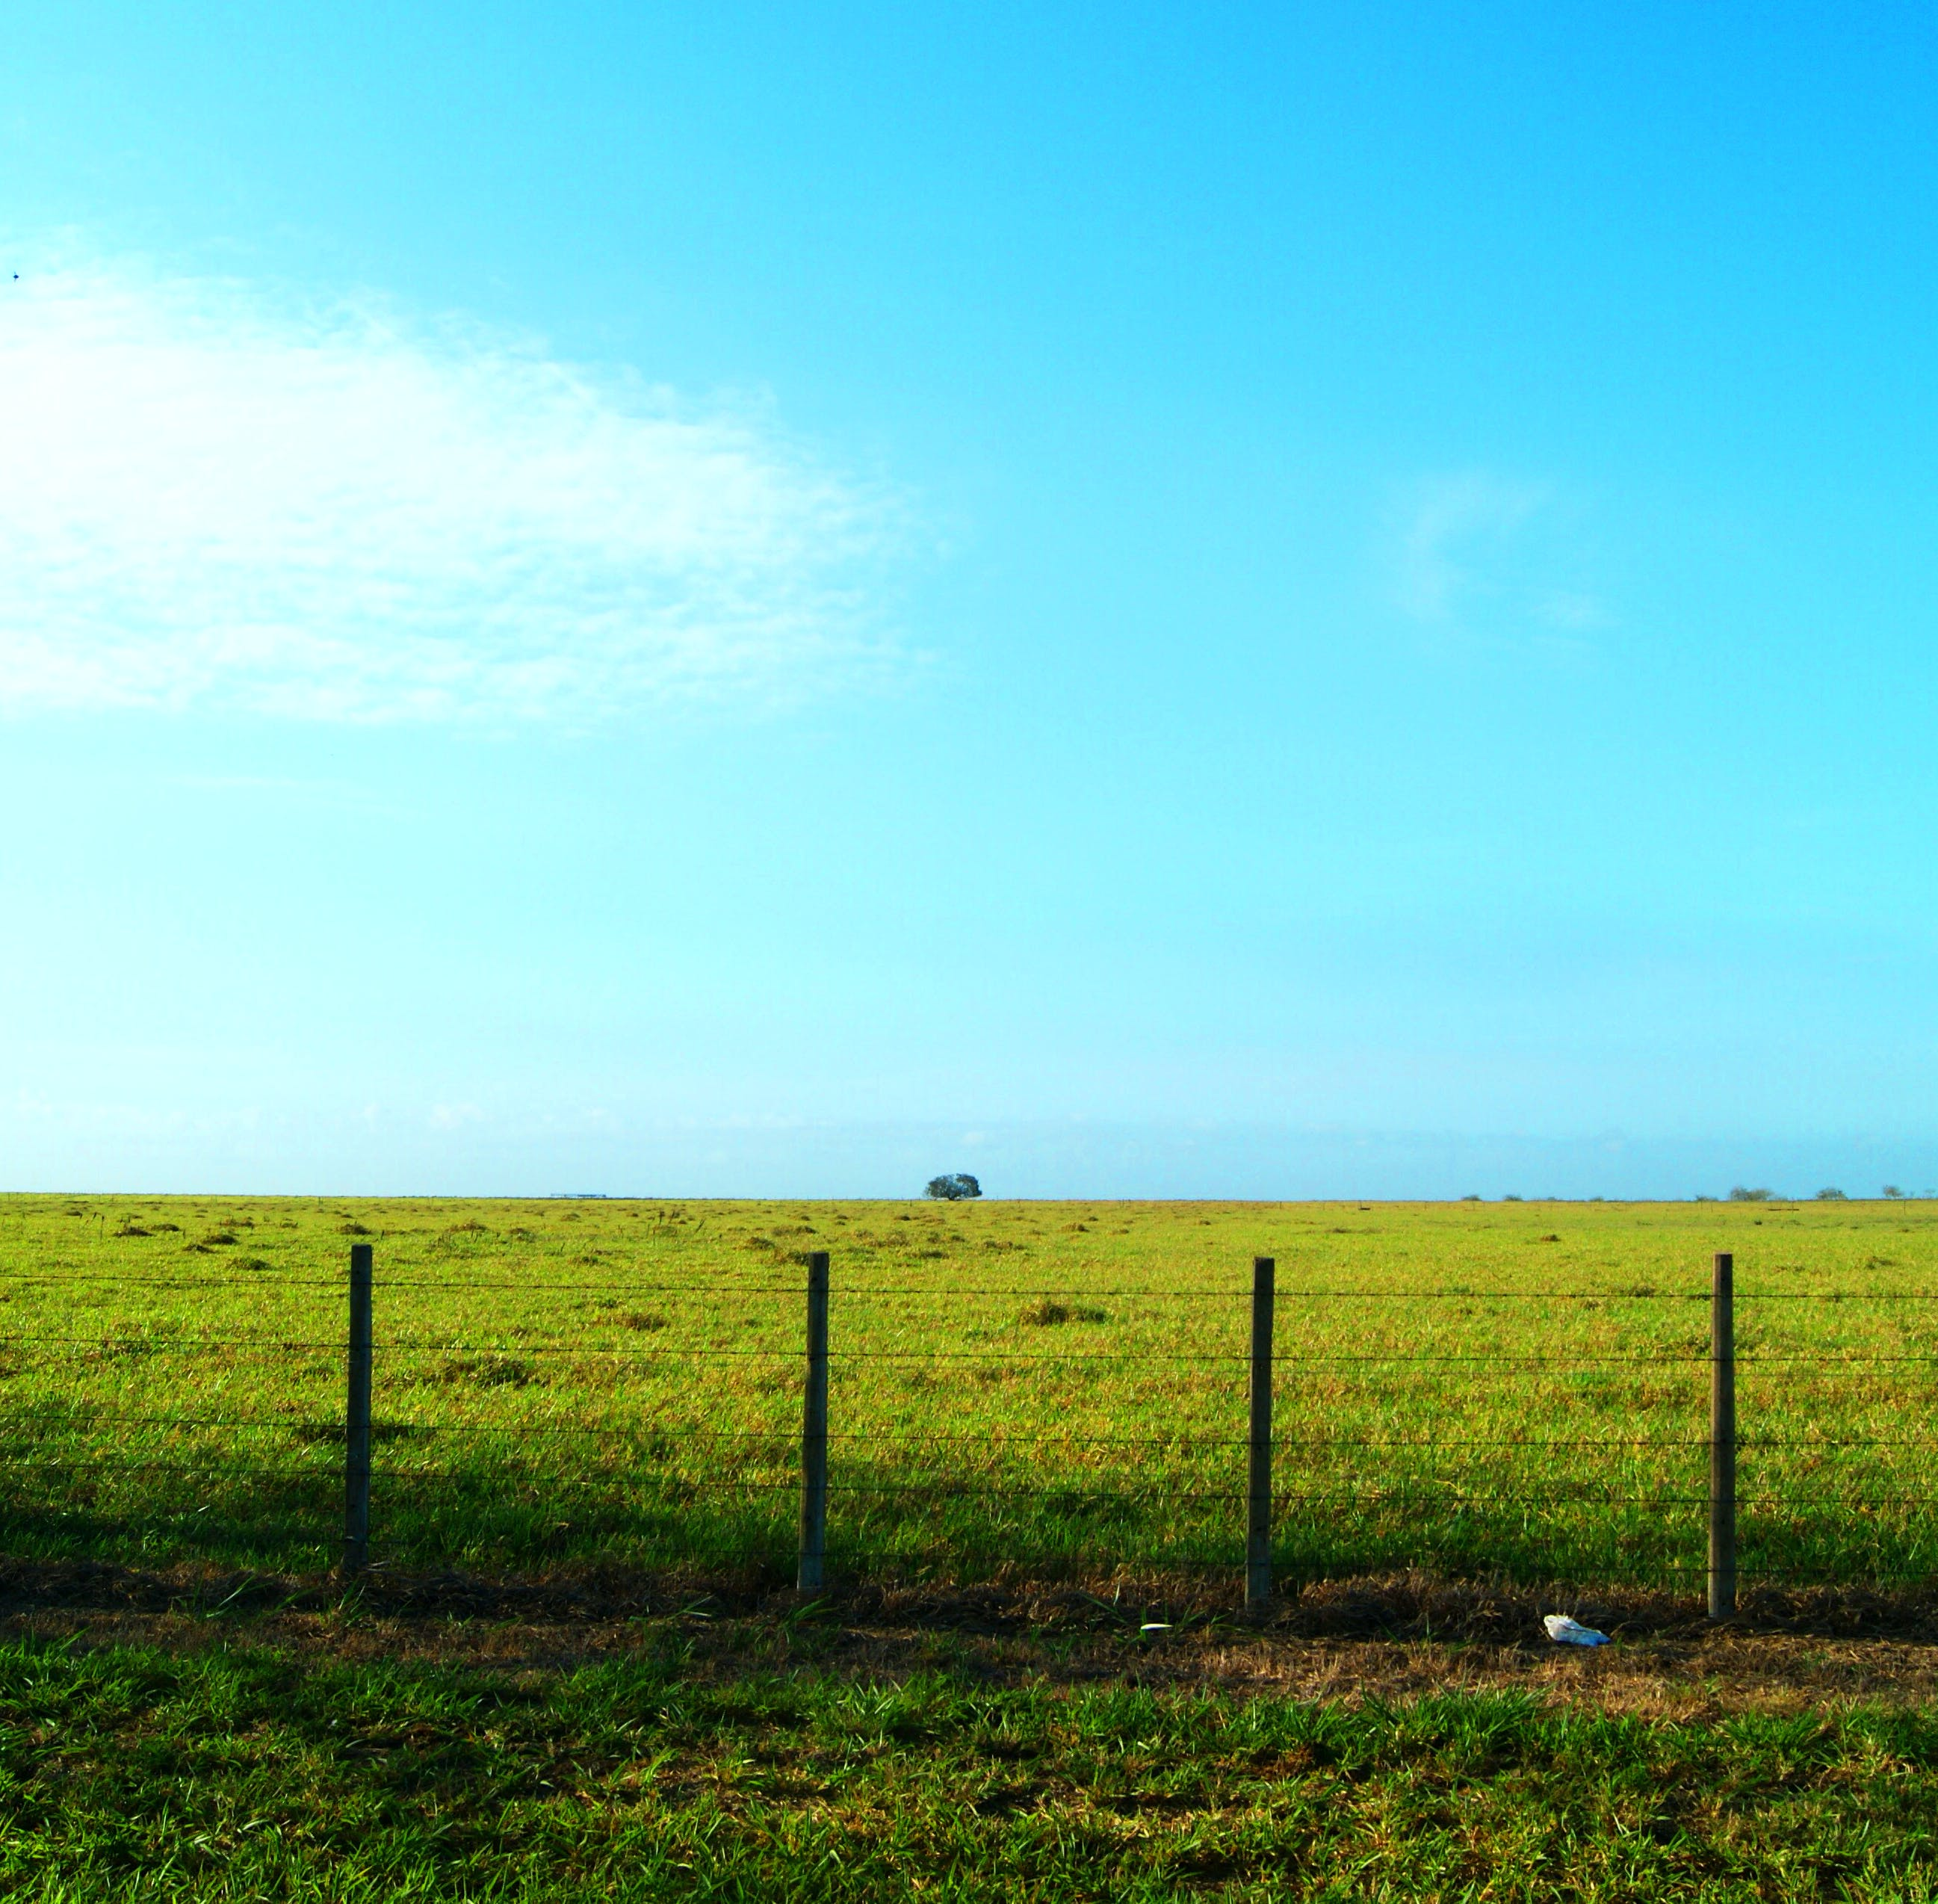 Greenfield Behind Blue Sky